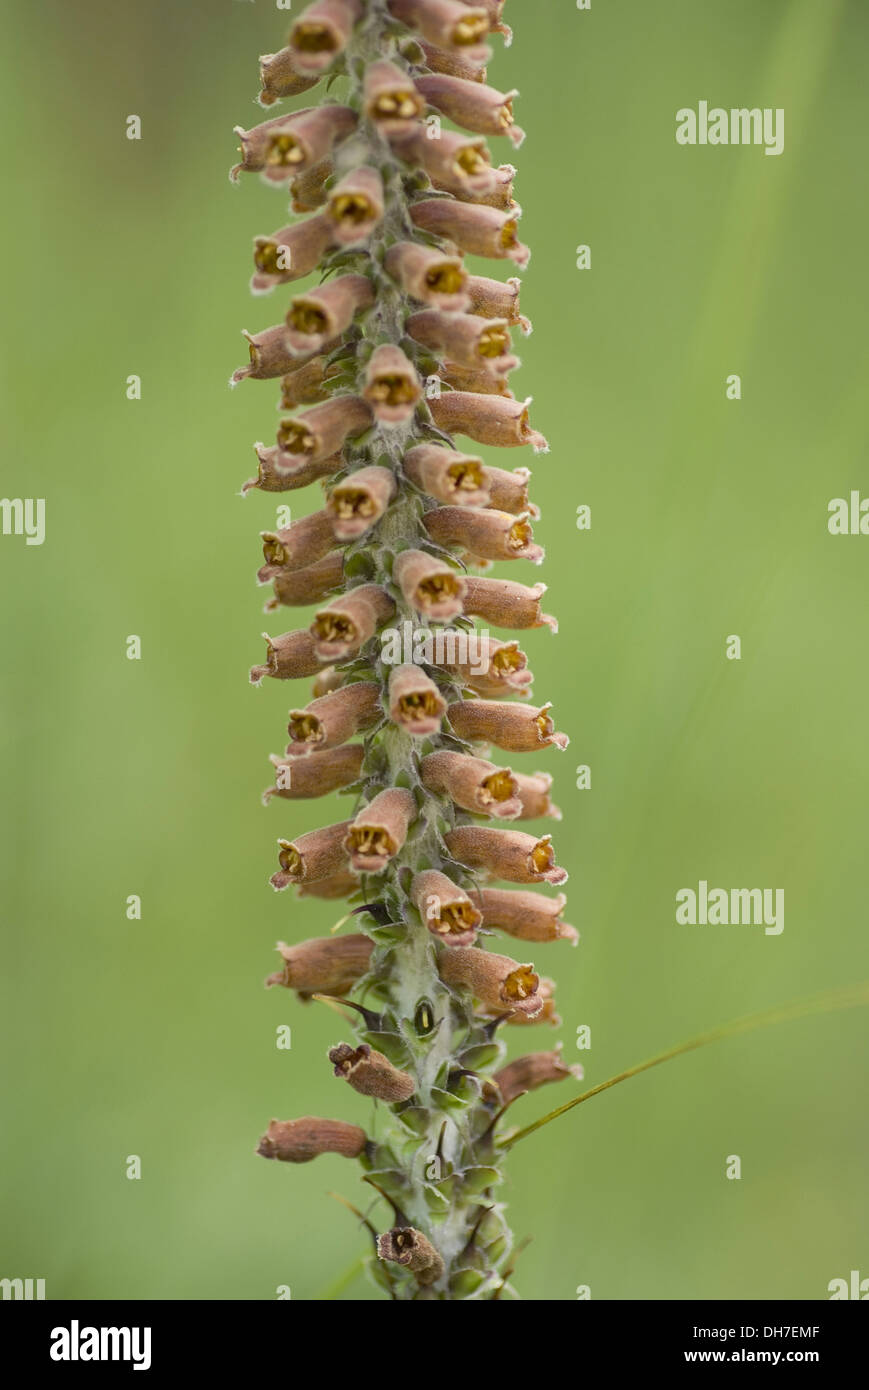 foxglove, digitalis parviflora - Stock Image